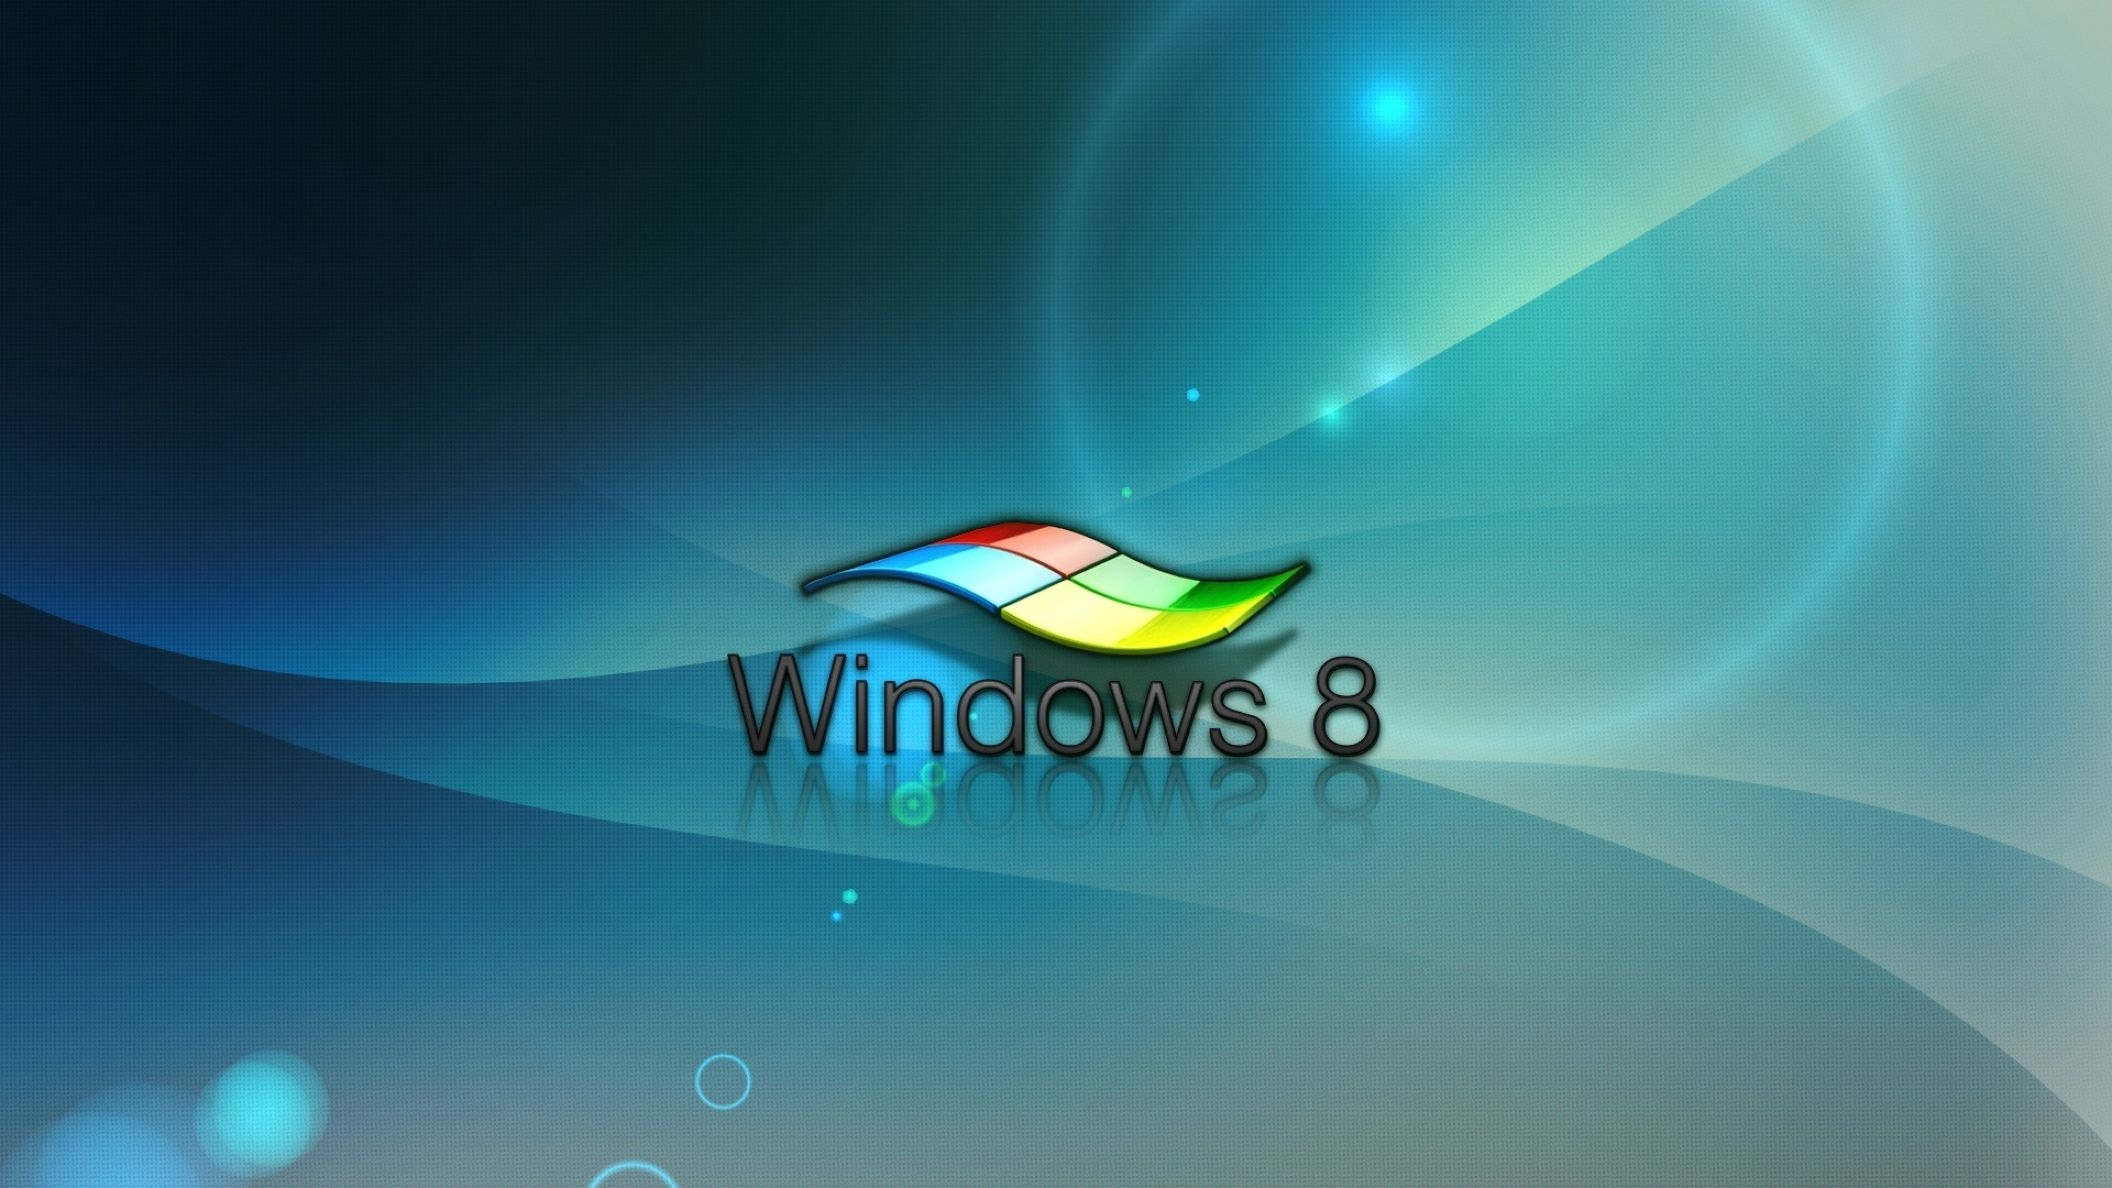 3d hd for windows 8 wallpaper: desktop hd wallpaper - download free